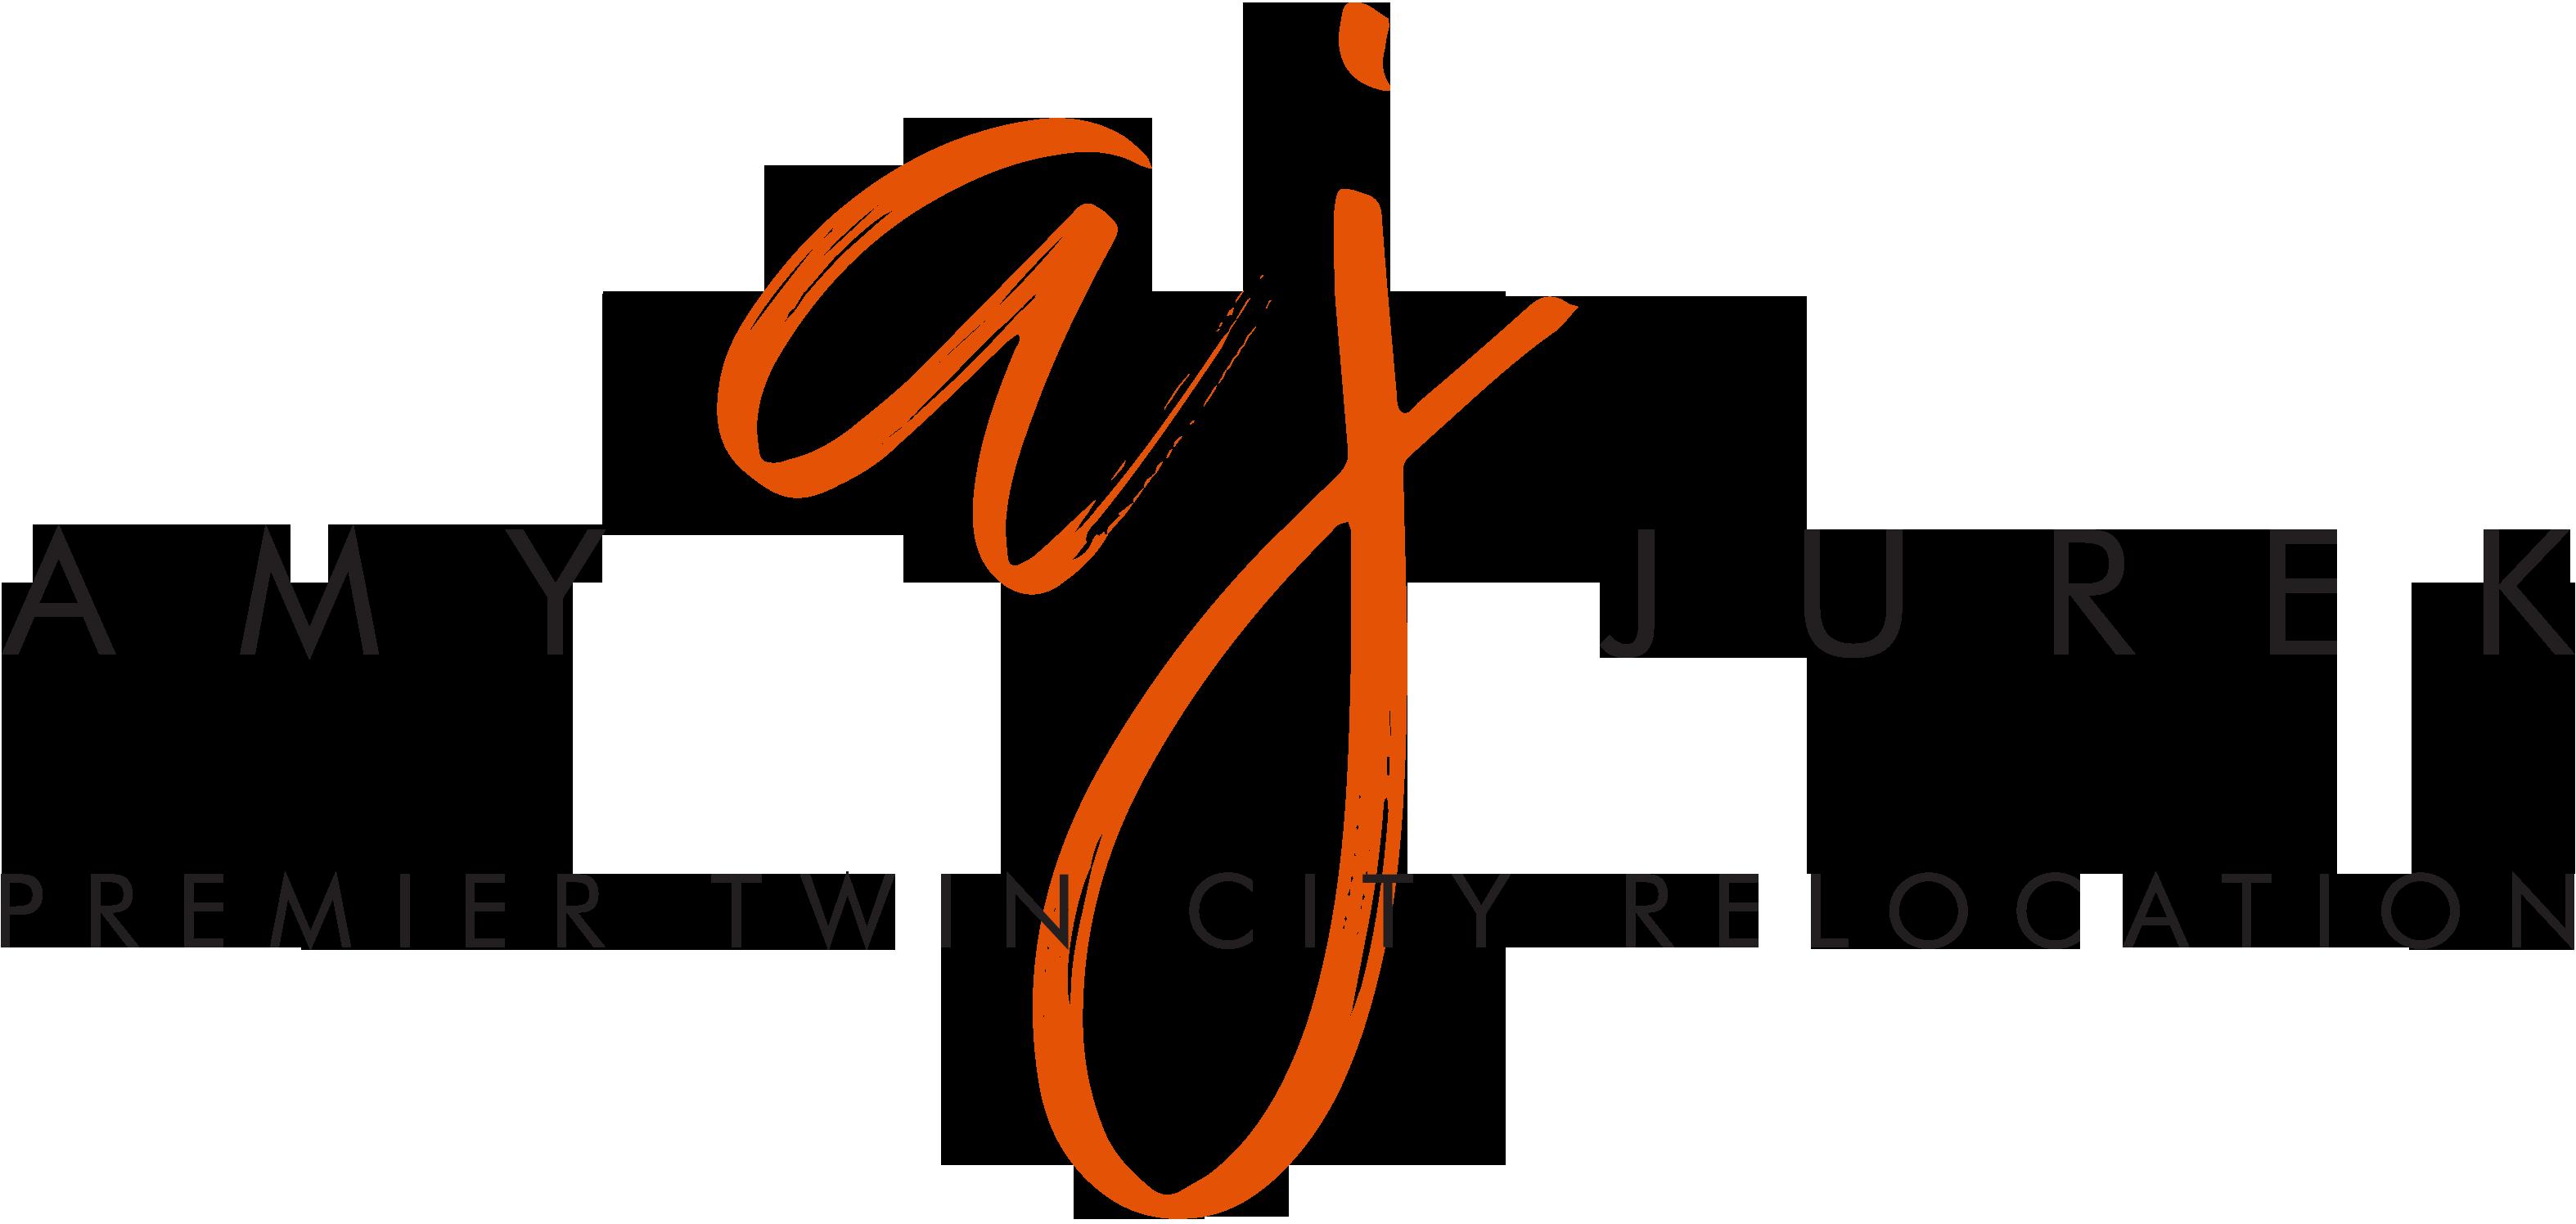 Amy Jurek Contact Info